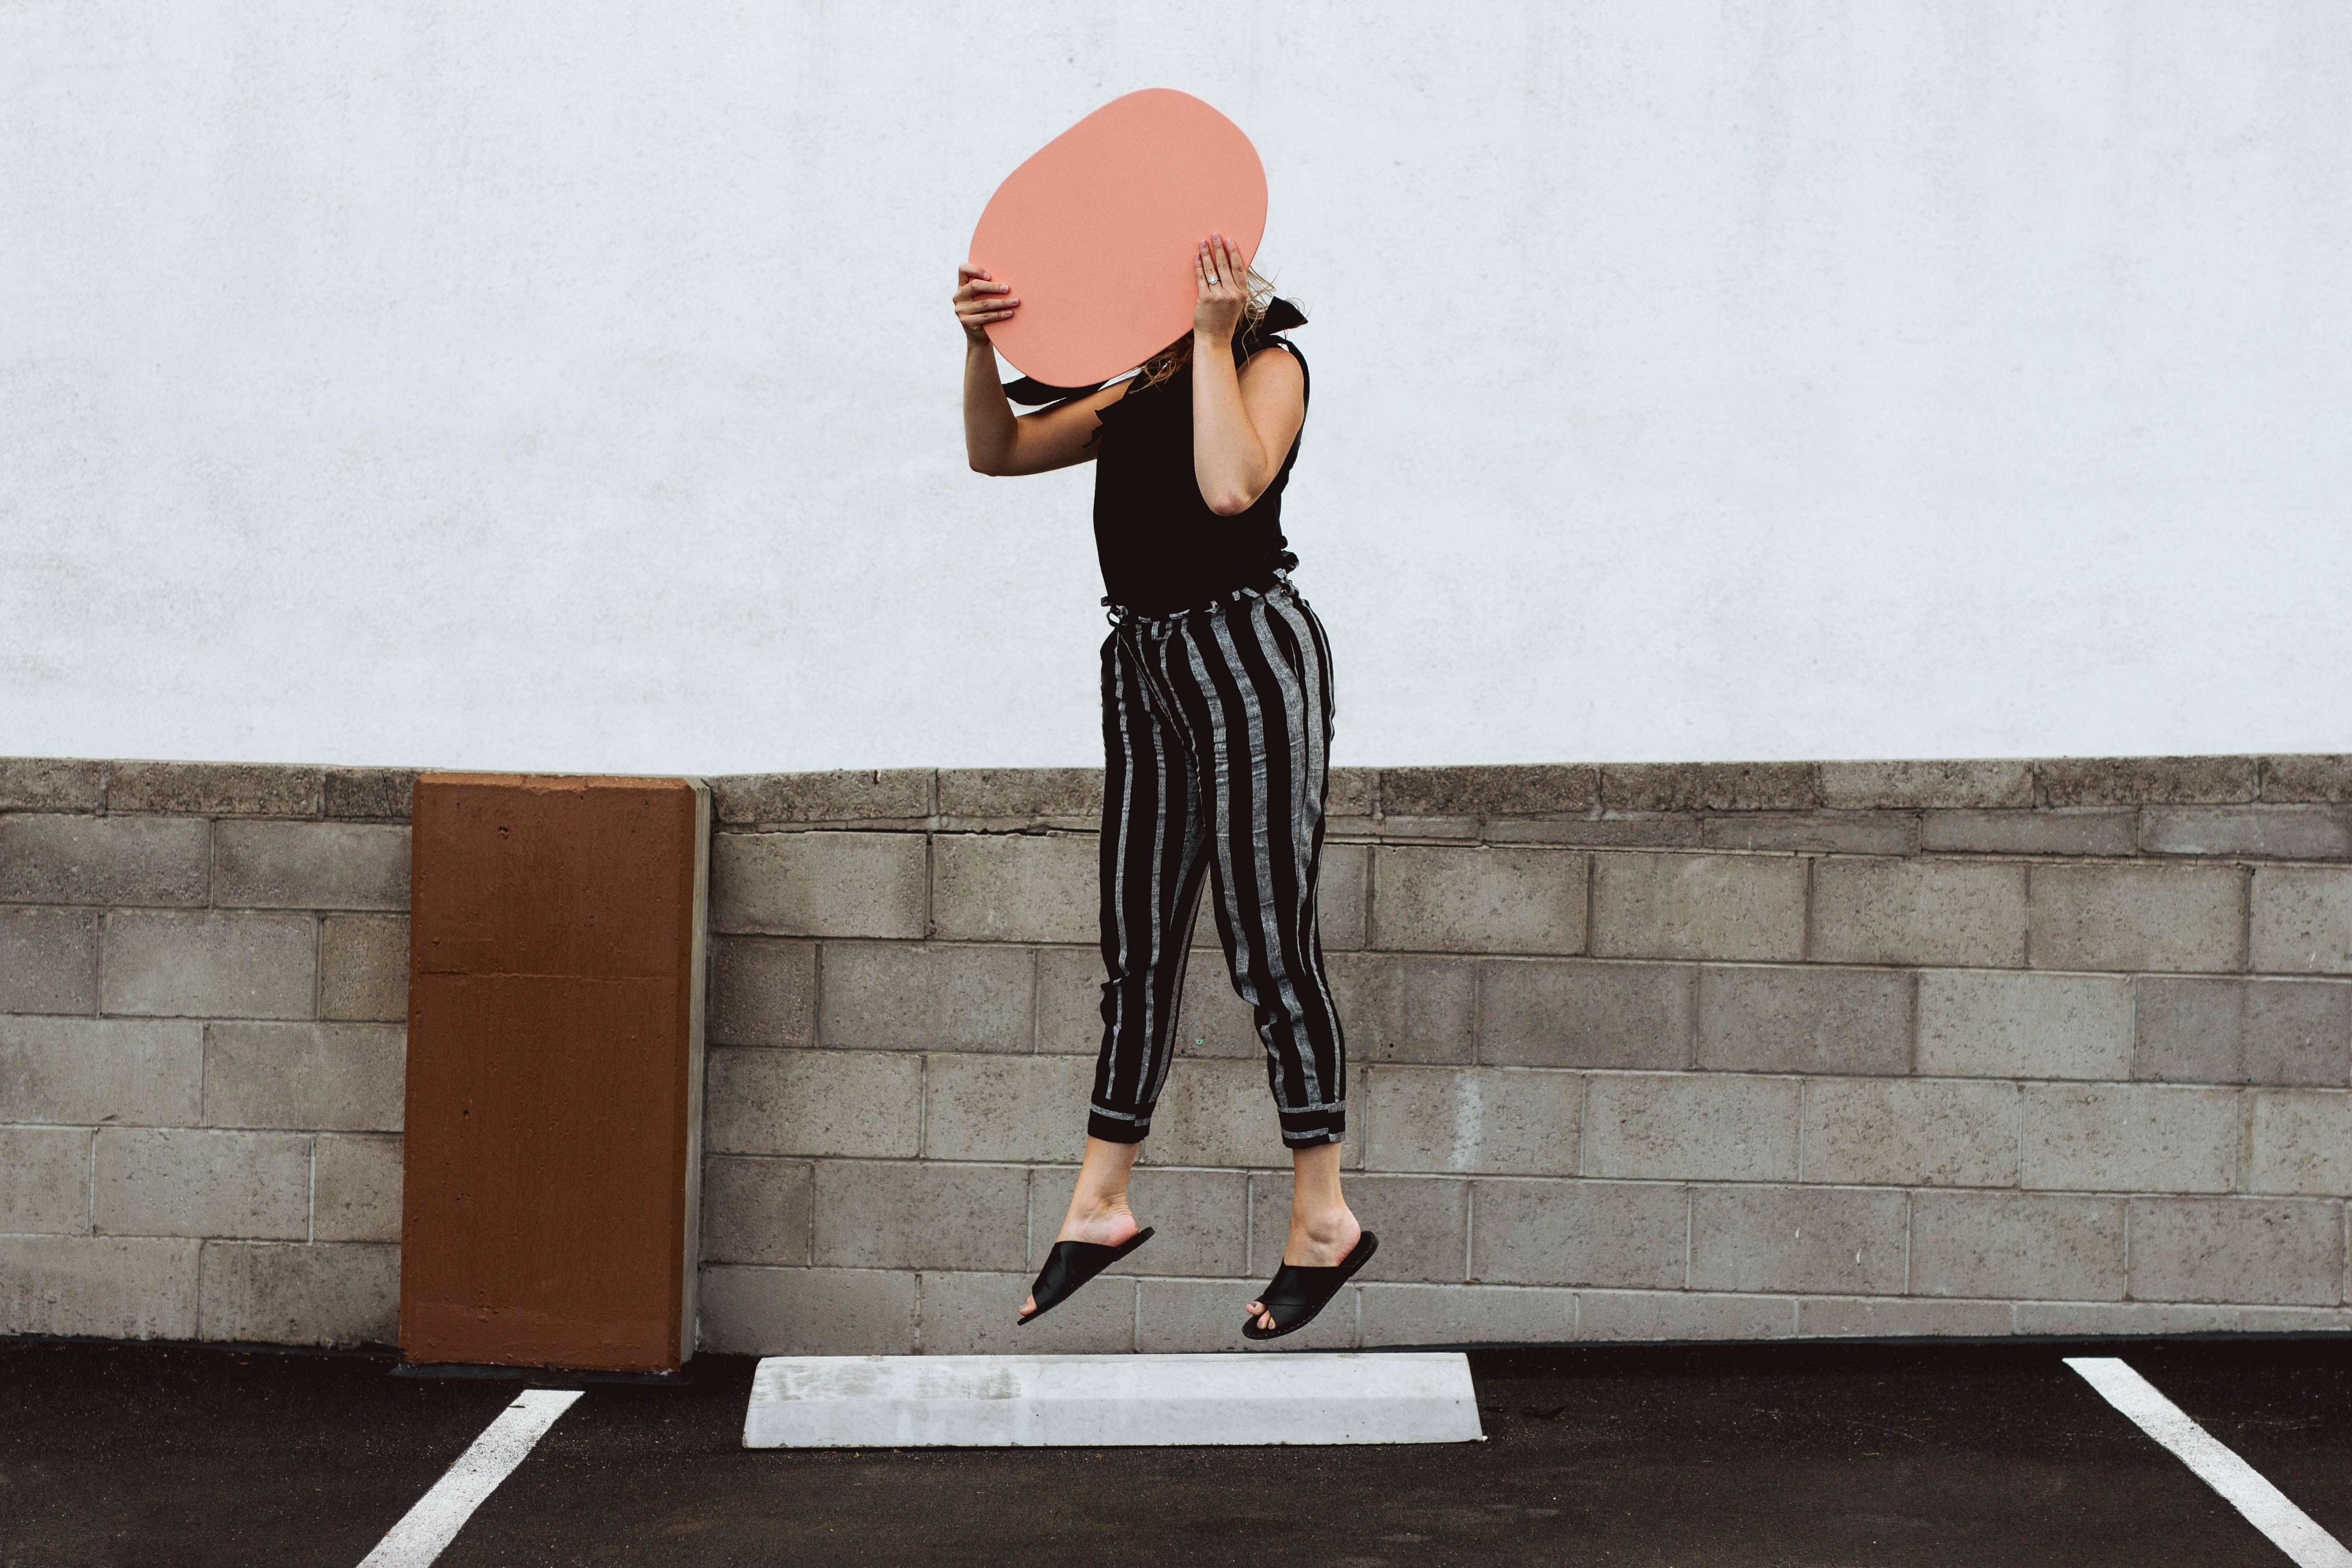 Mabble Media - Creative Agency | Taylor Steinhardt